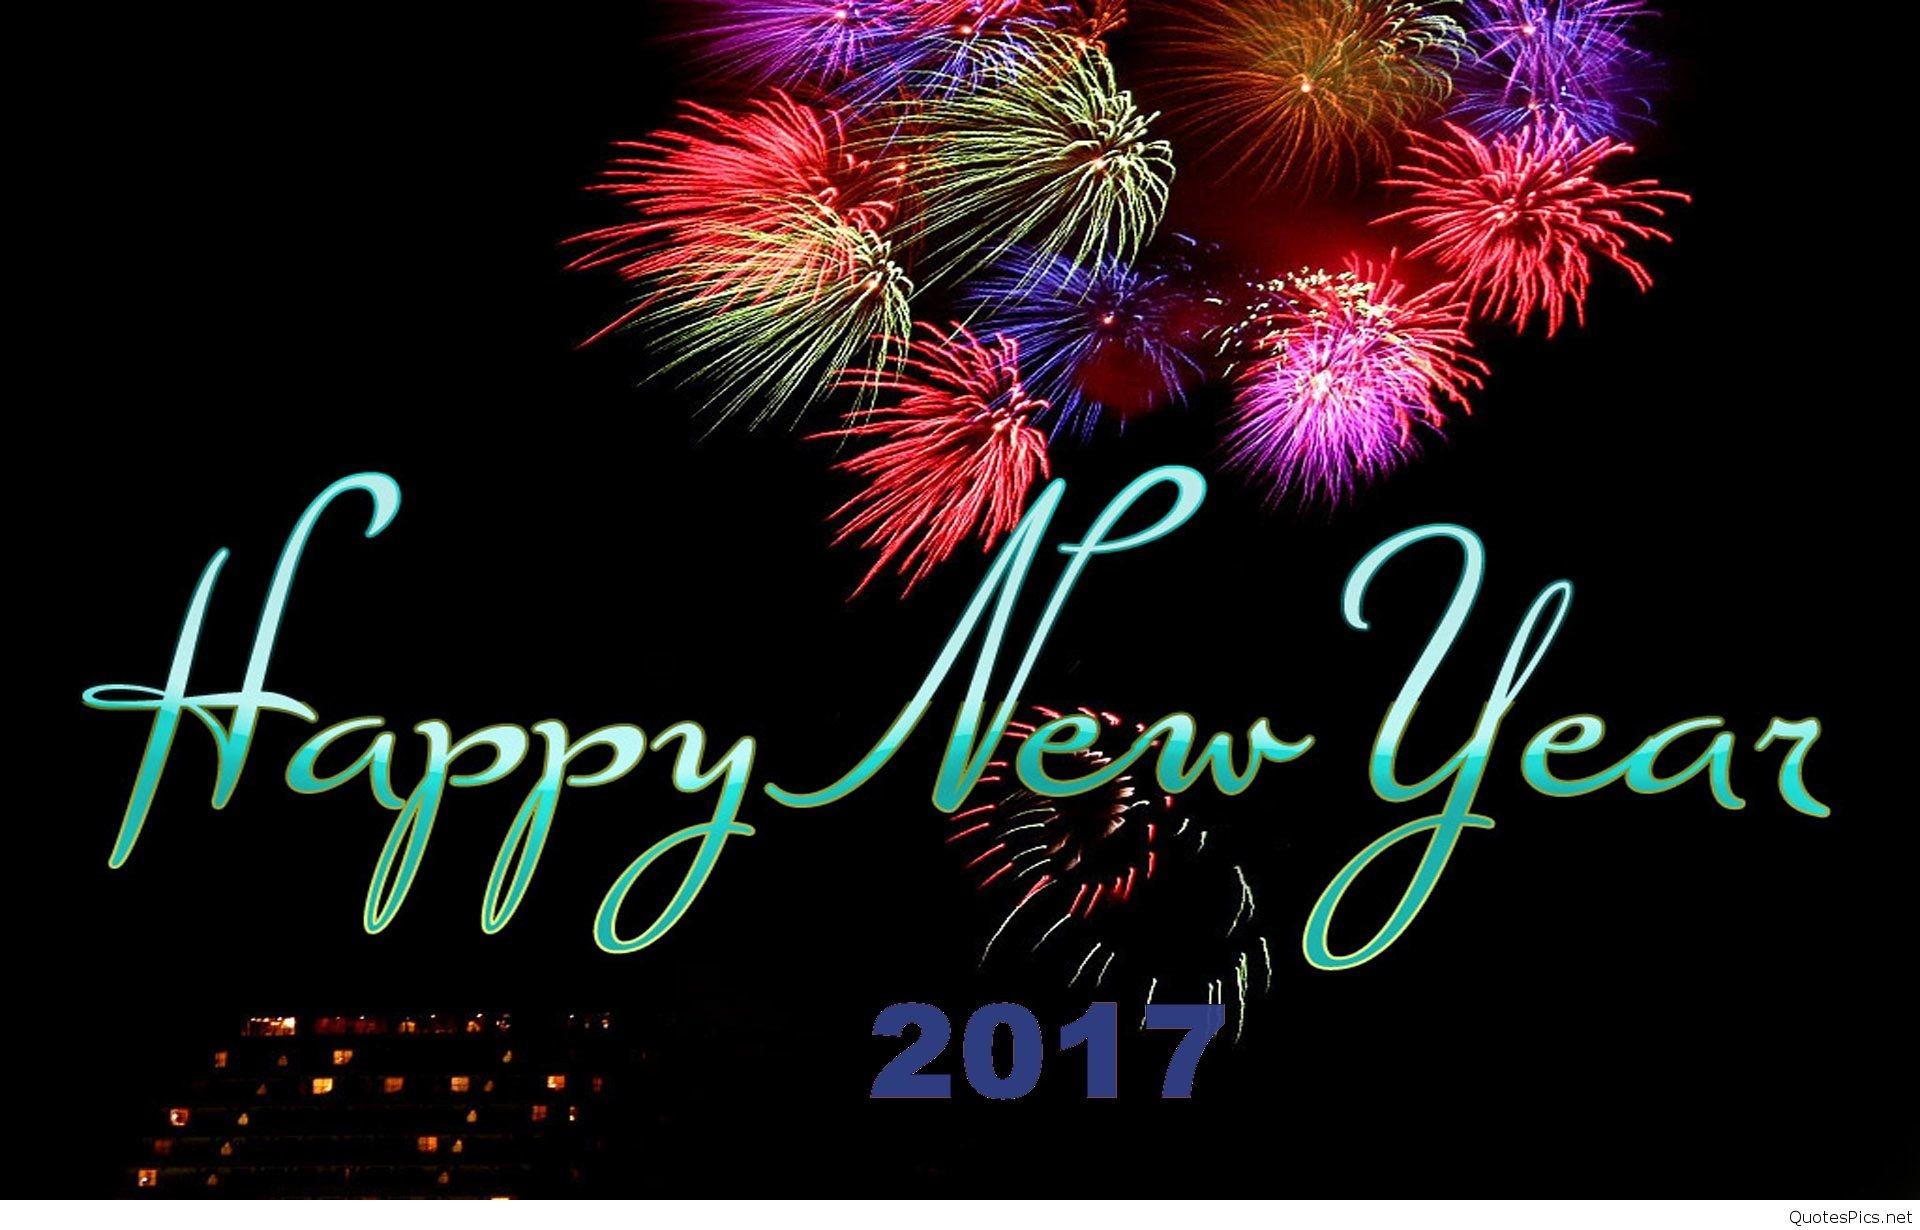 New Year Wallpaper 2017 (12)